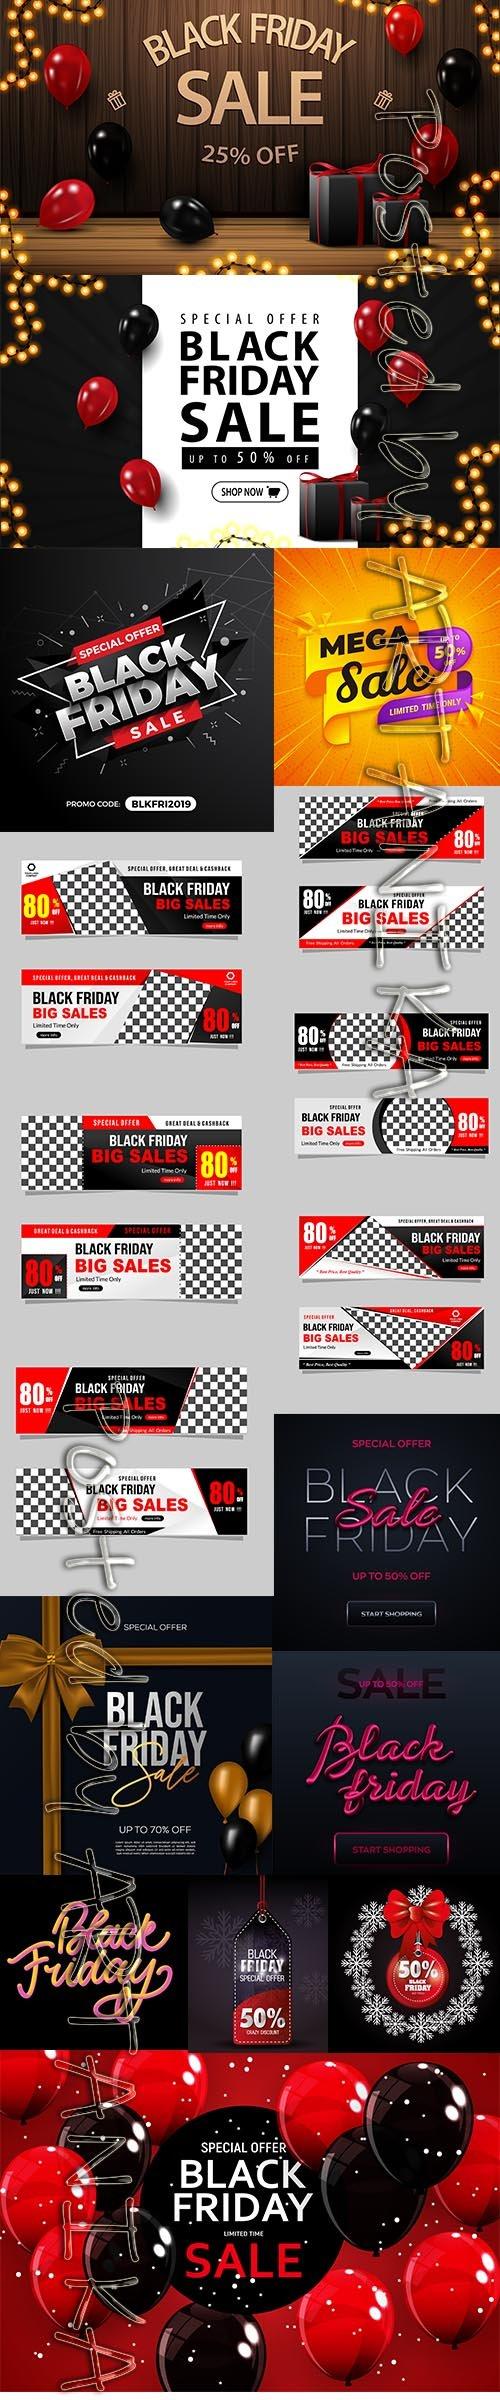 Black Friday Sale Backgrounds Vol 4